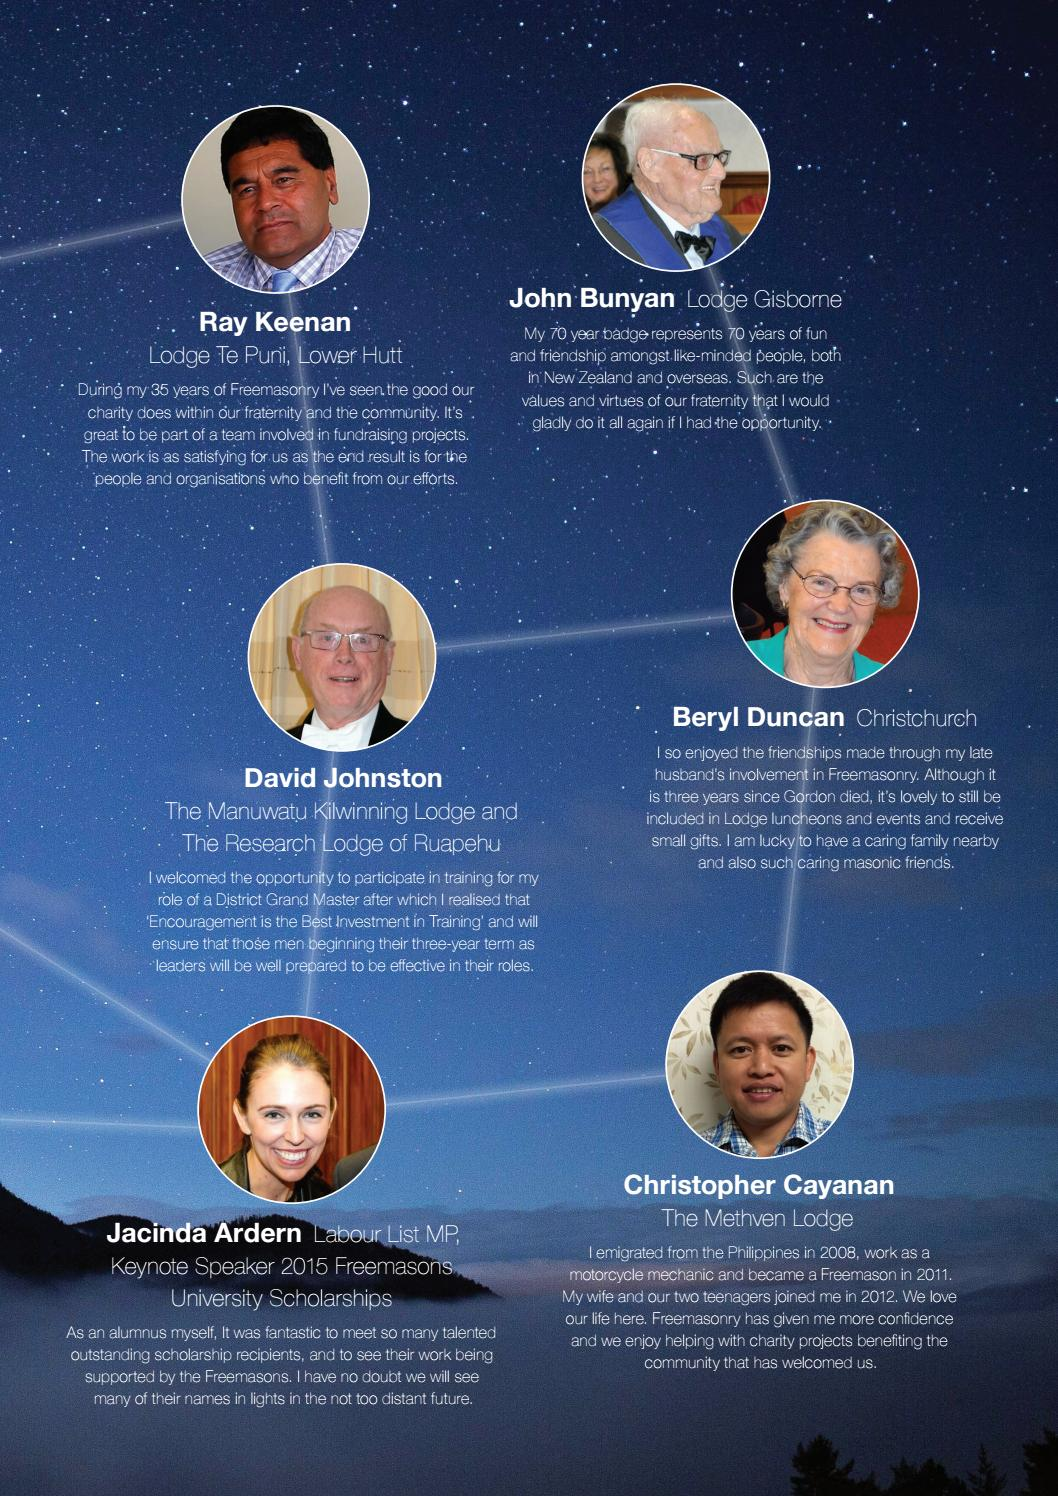 NZ Freemason magazine Issue 4 December 2016 by Freemasons New